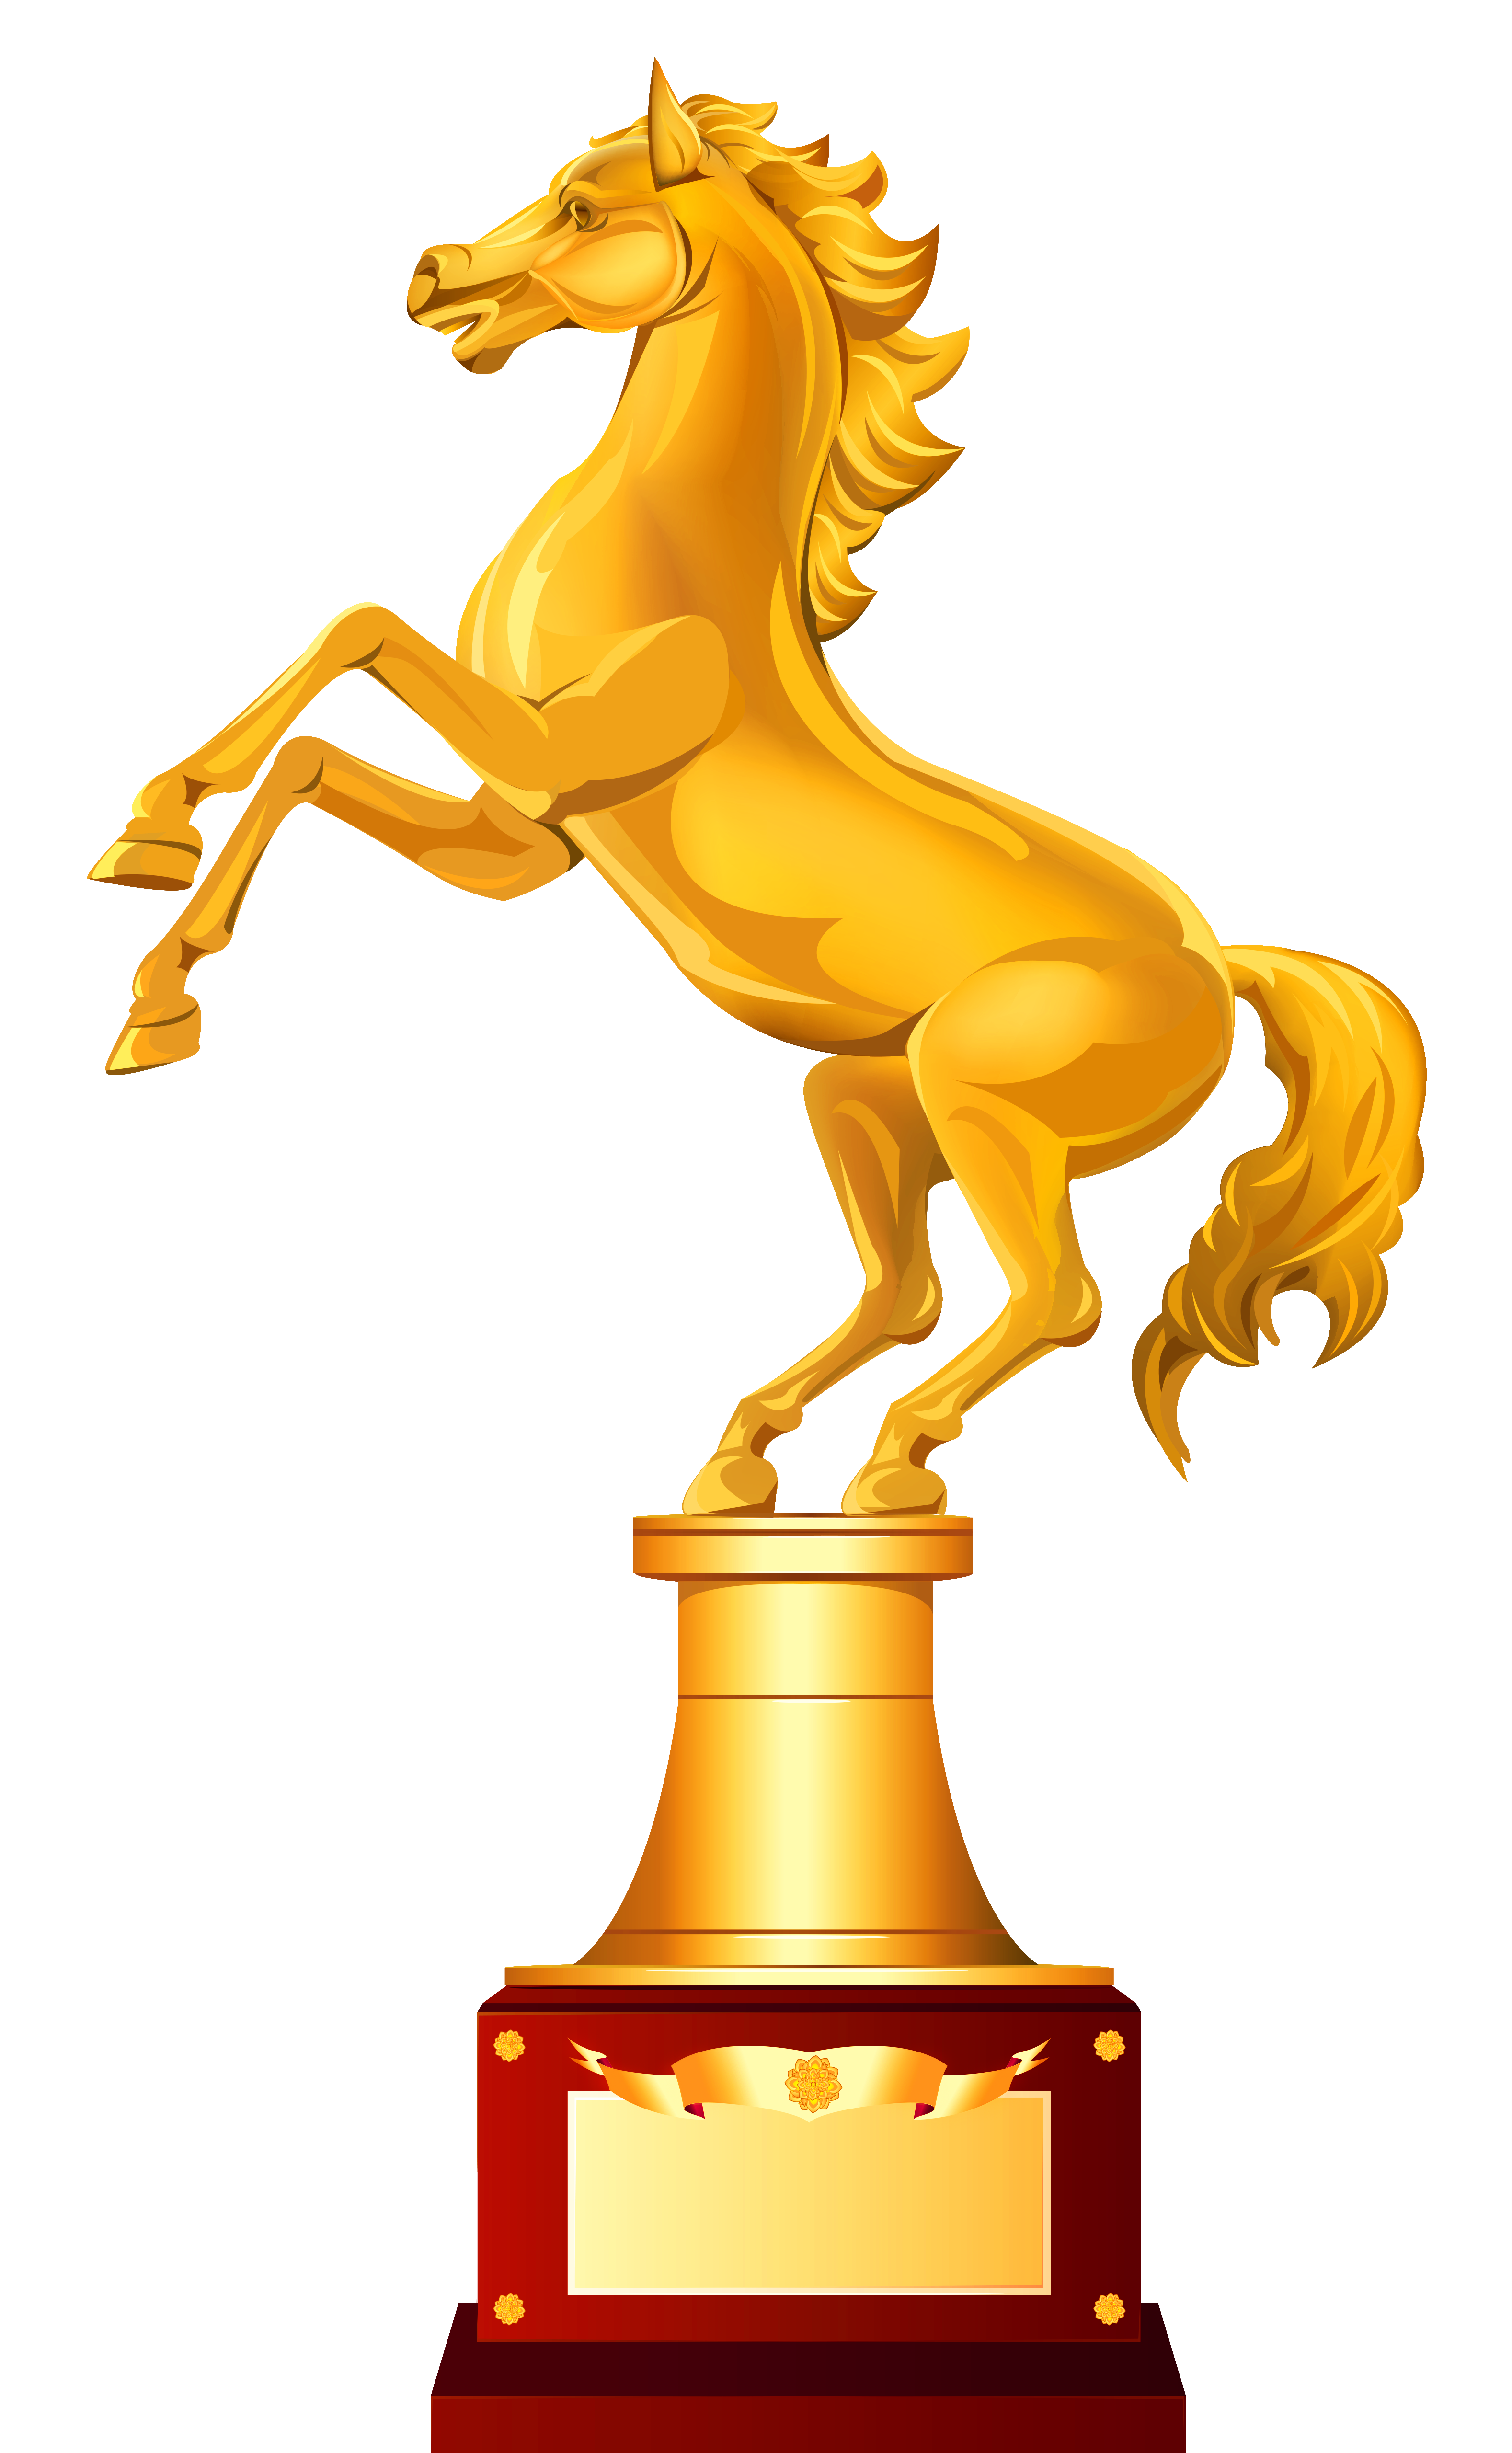 Clipart gold star award transparent download Golden Horse Trophy PNG Clipart Image   Gallery Yopriceville - High ... transparent download